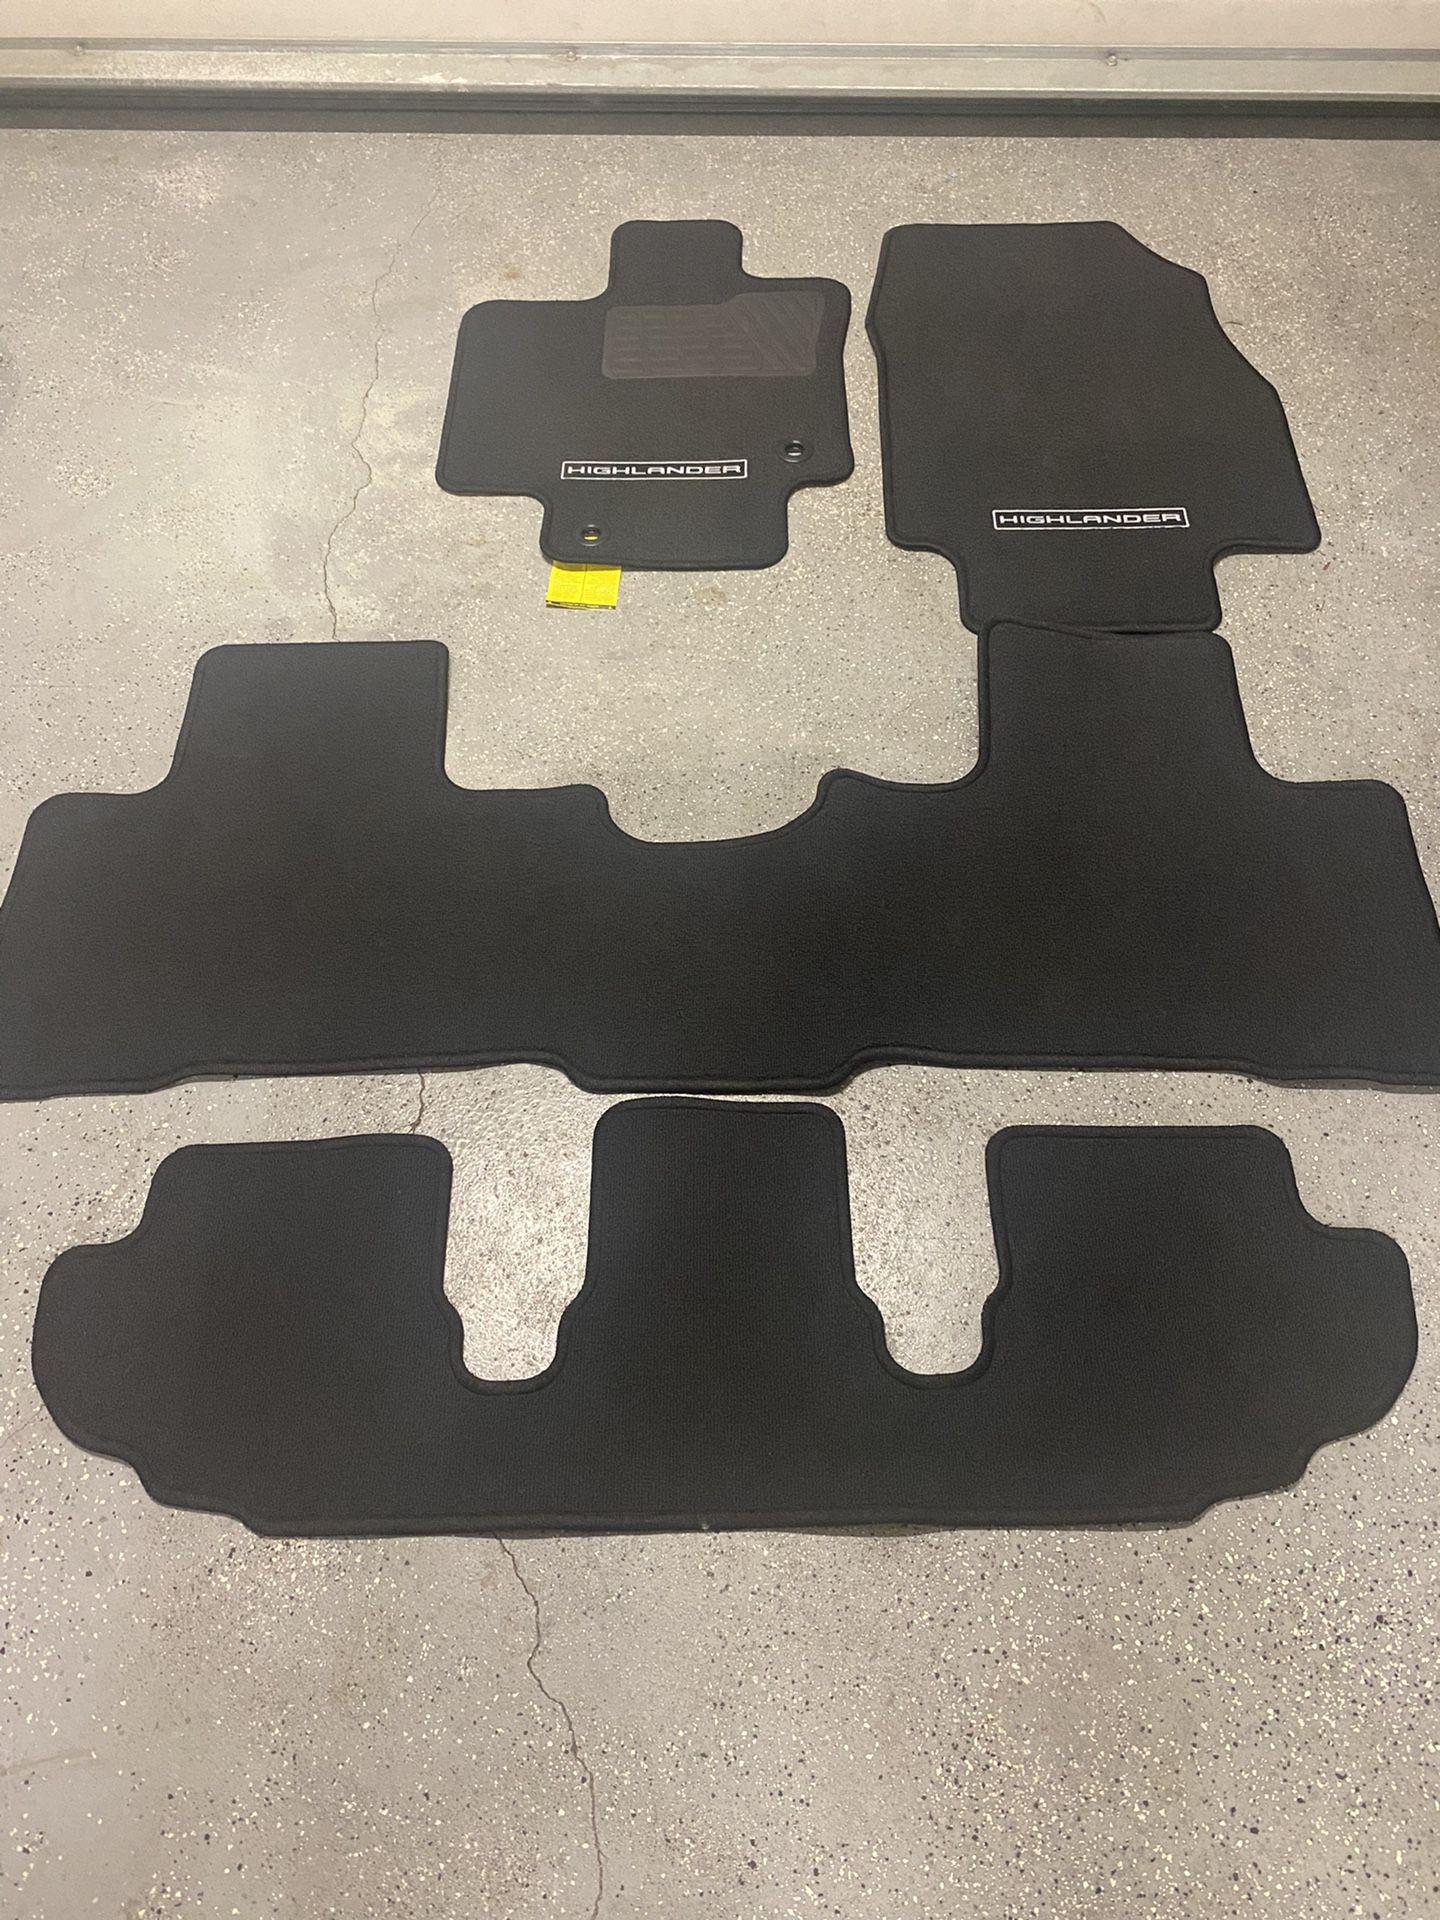 2021 Toyota Highlander Carpeted Floor Mats